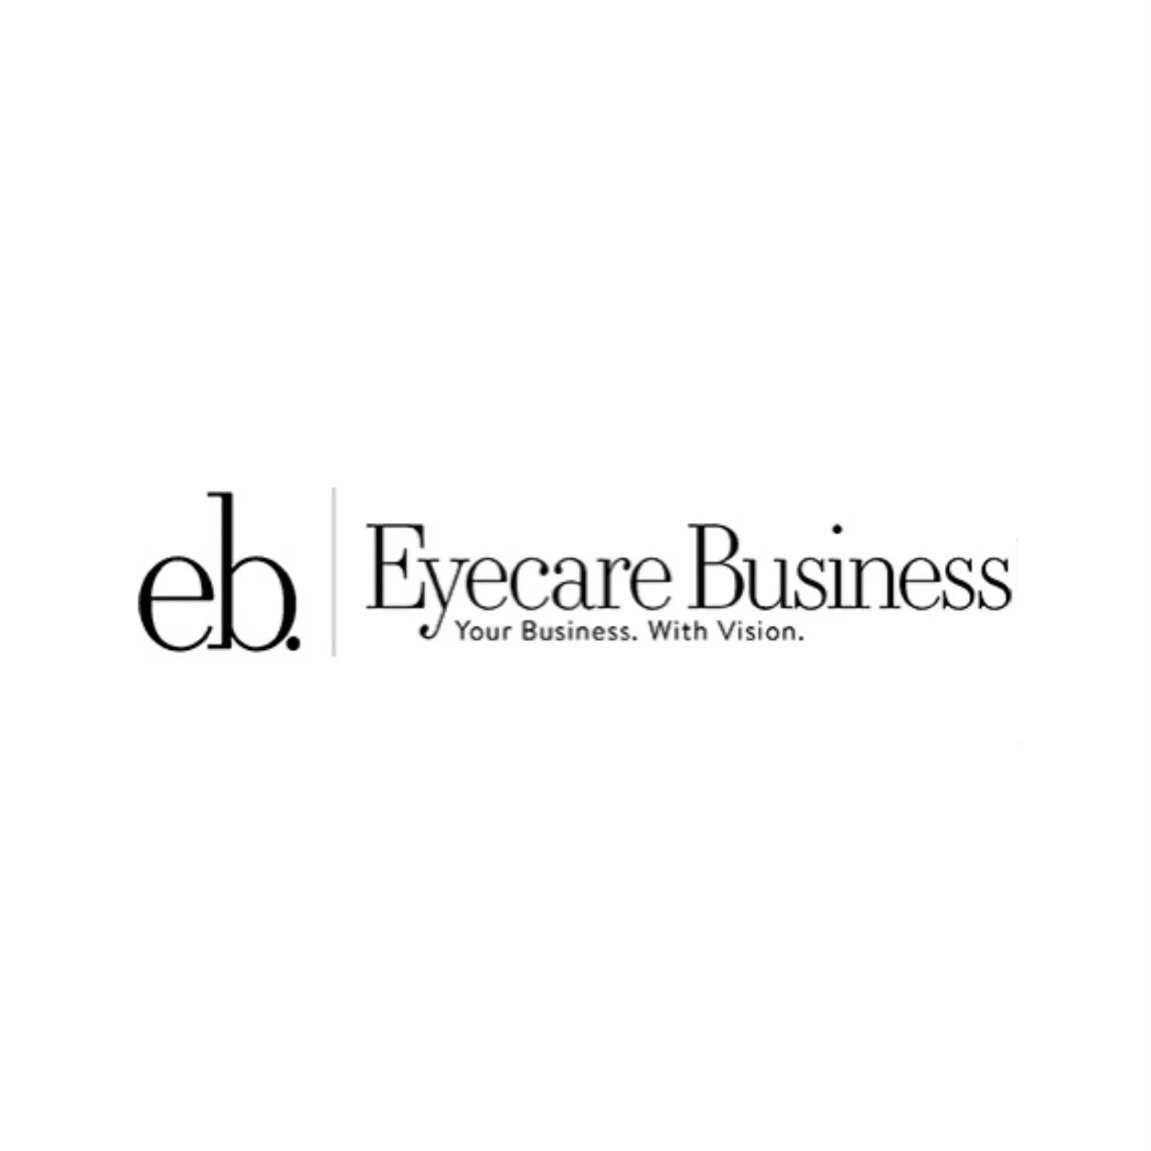 eyecare business logo